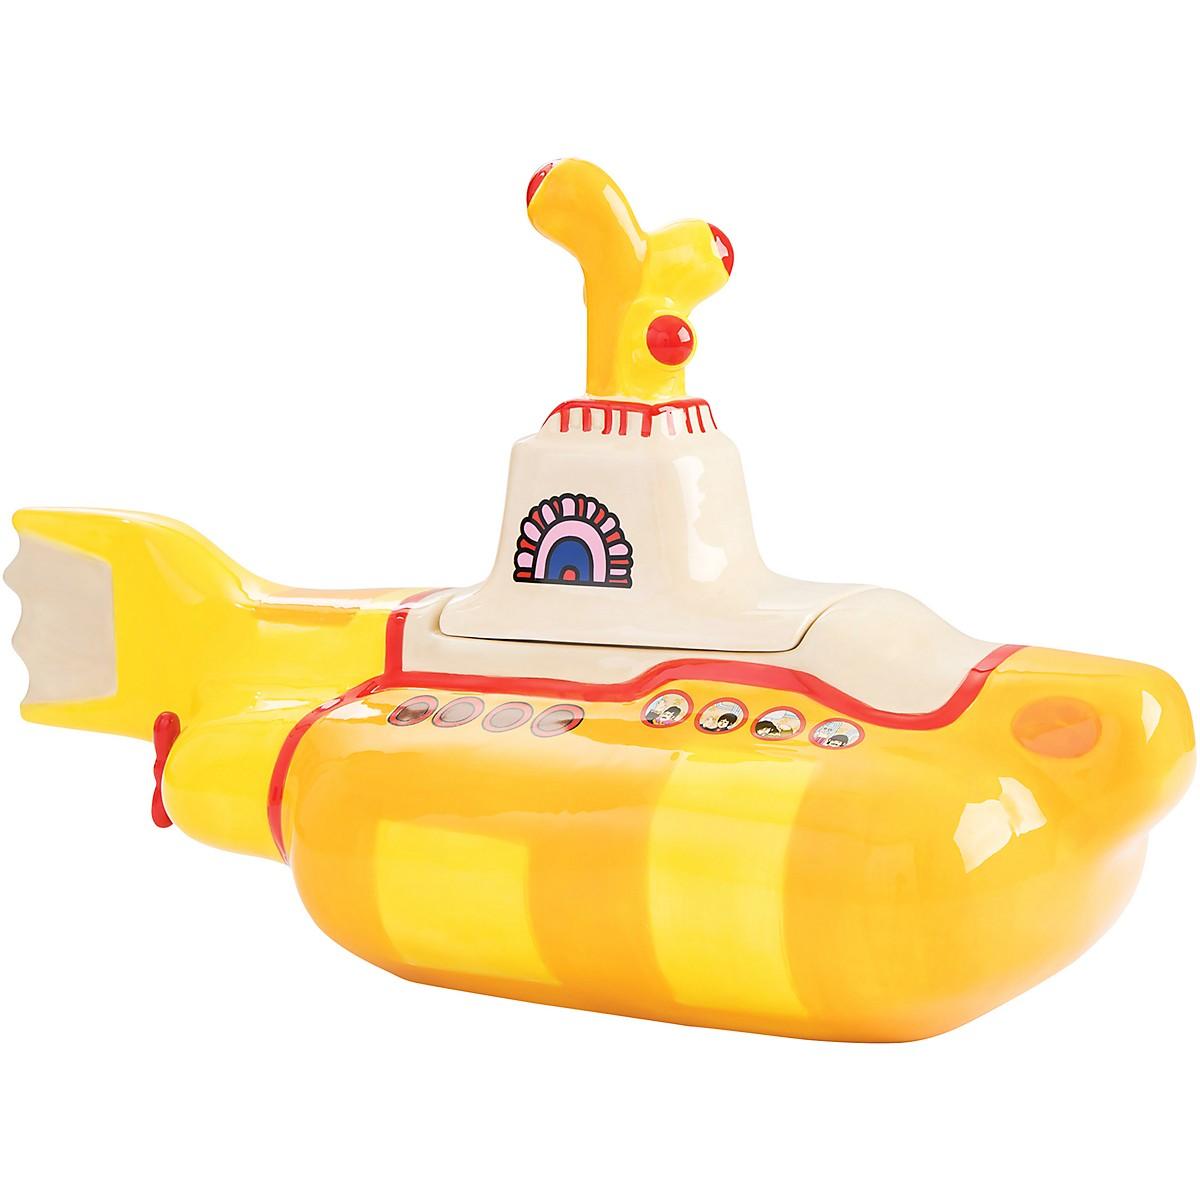 Vandor The Beatles Yellow Submarine Sculpted Cookie Jar